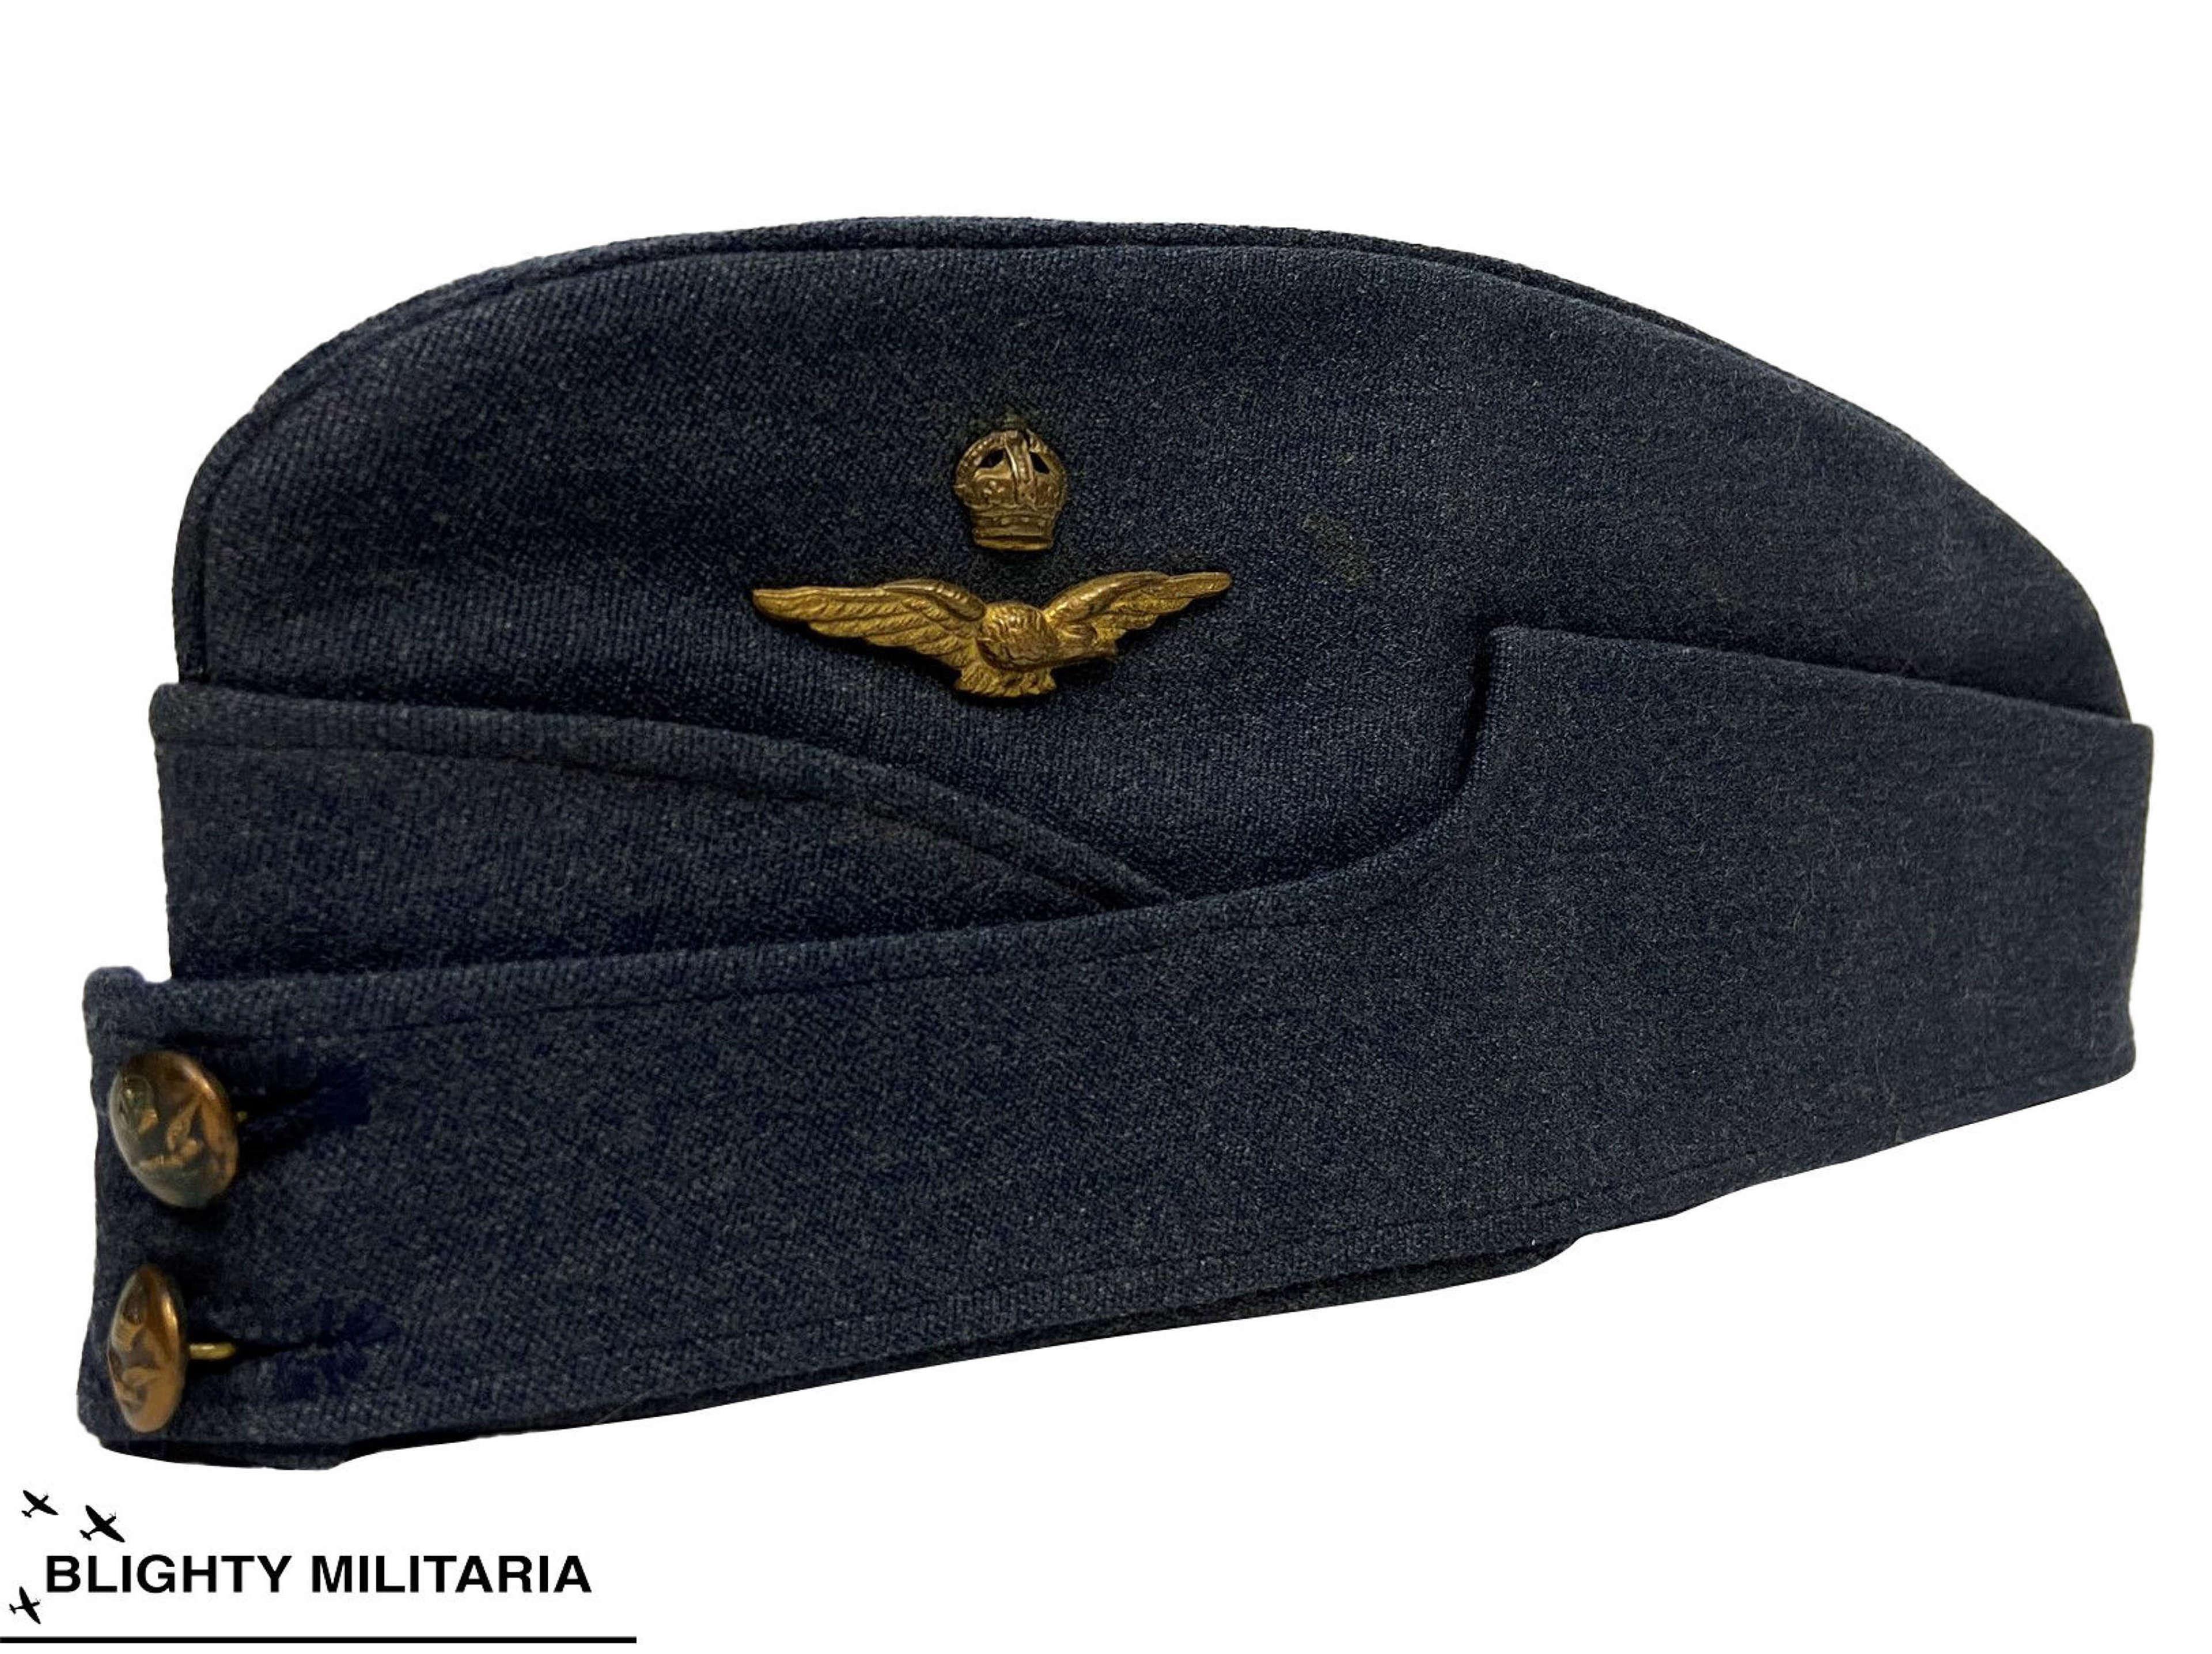 Original WW2 RAF Officers Forage Cap - Large Size